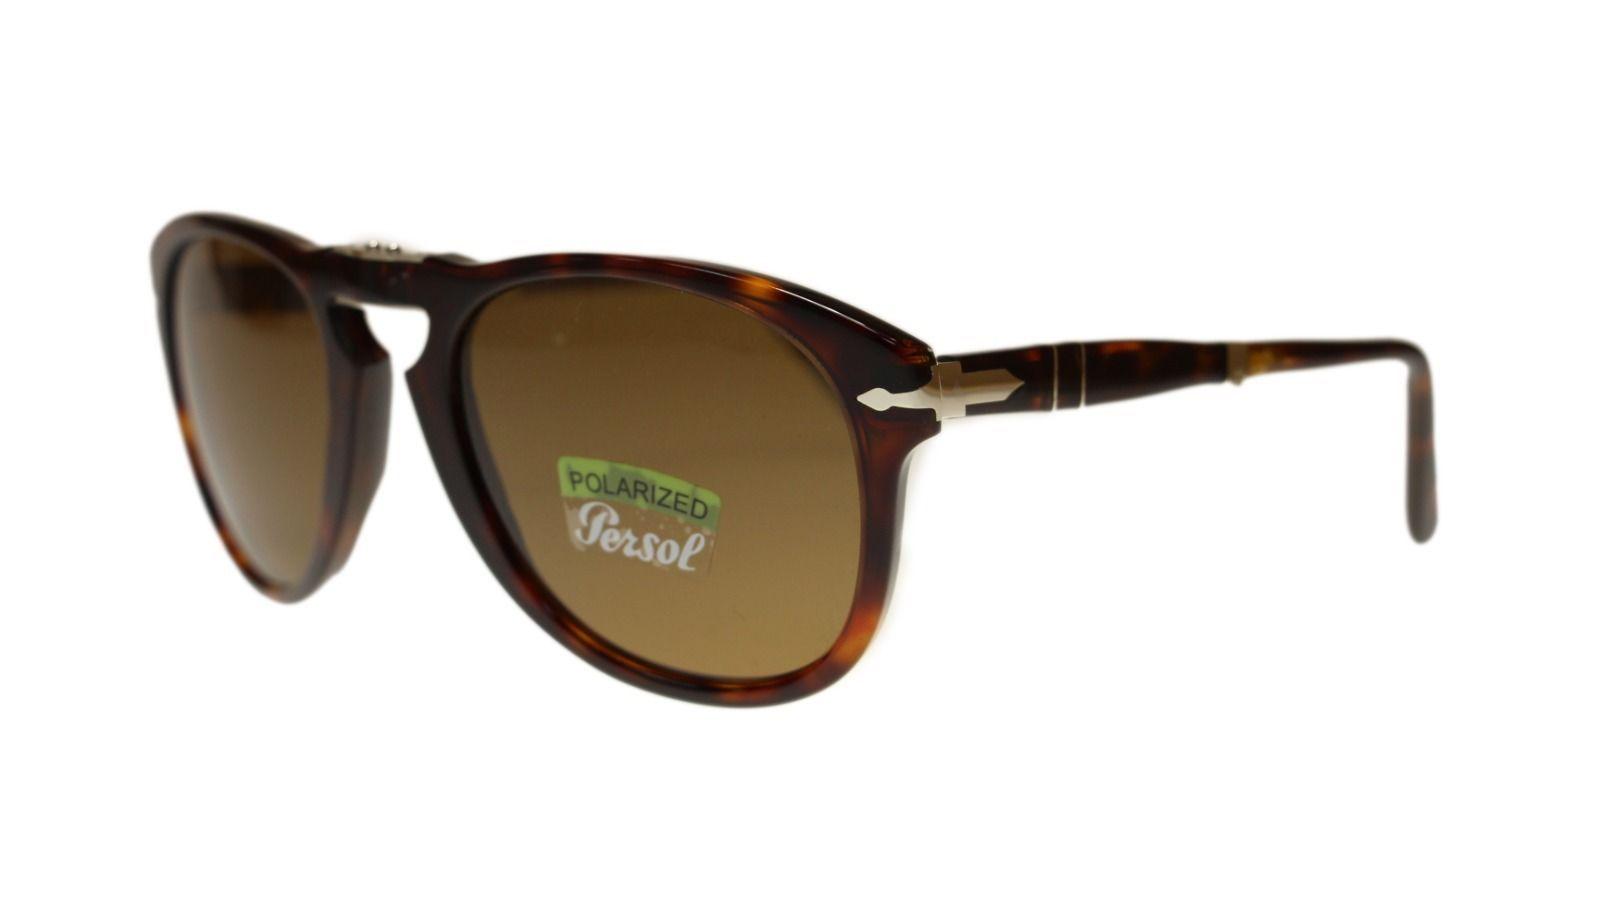 b50189c2b00 S l1600. S l1600. Previous. Persol Mens Sunglasses PO714 24 57 Havana Brown  Polarized Aviator 54mm Authentic. Persol Mens Sunglasses ...